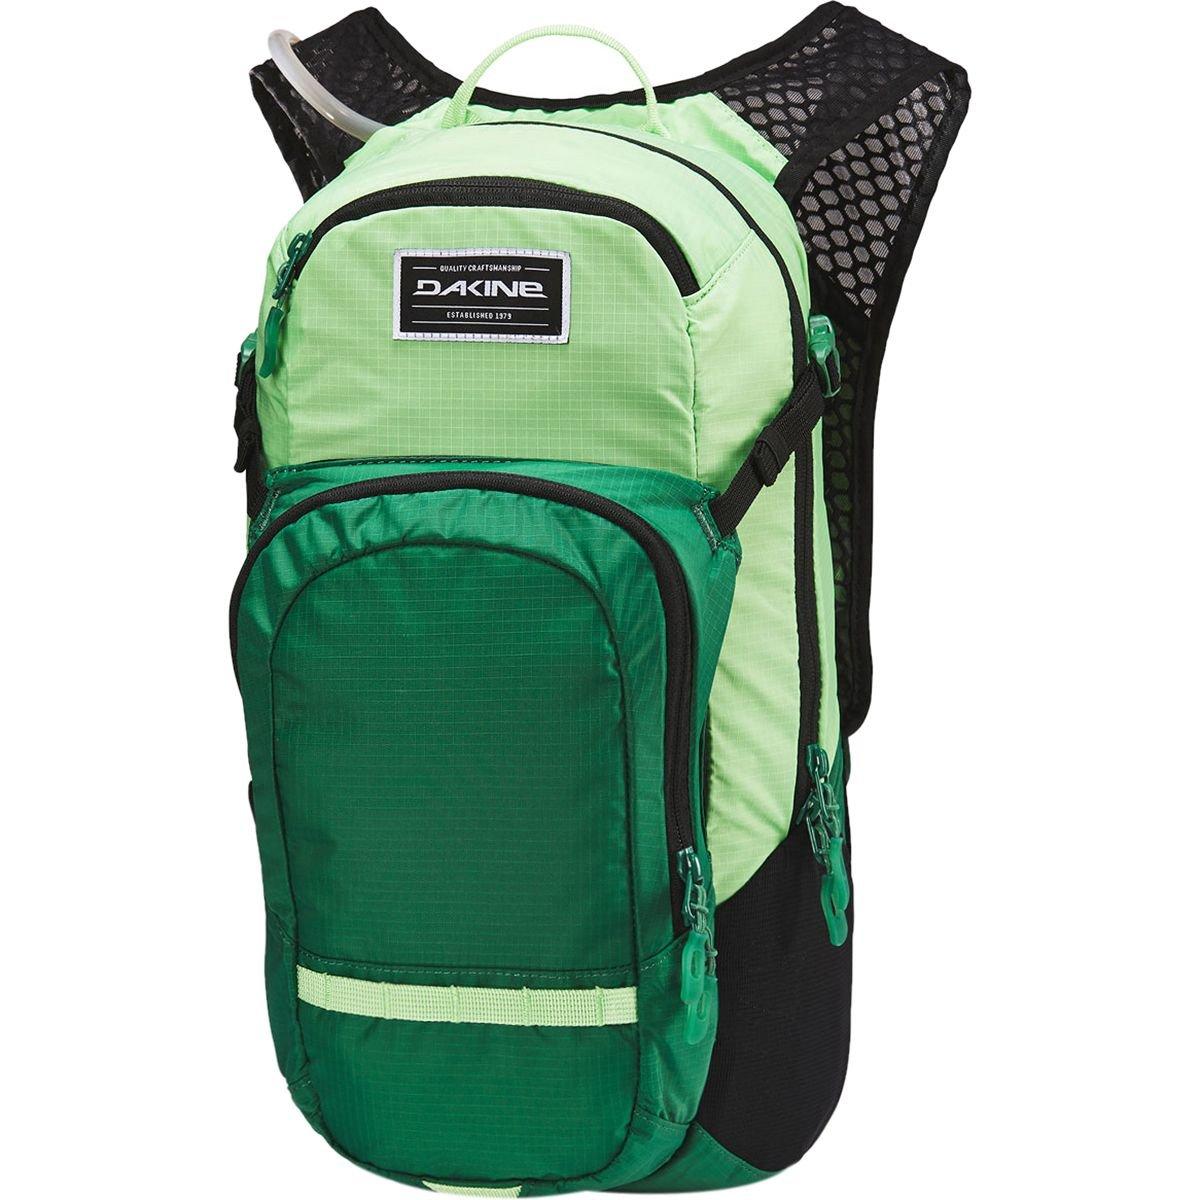 Dakine Session 16L Backpack Summer Green/Fir, One Size